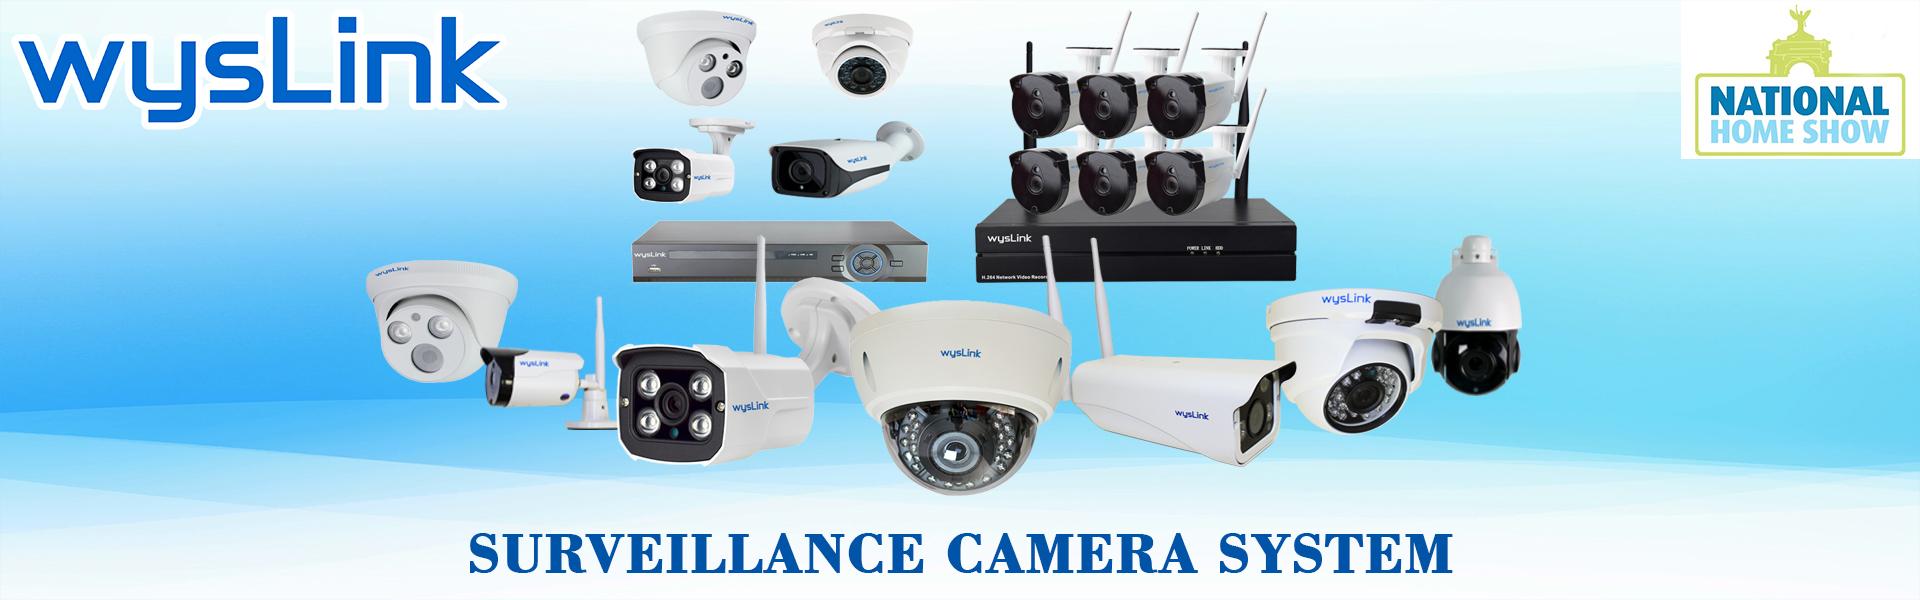 wysLink Surveillance Camera 1920×600 with new background